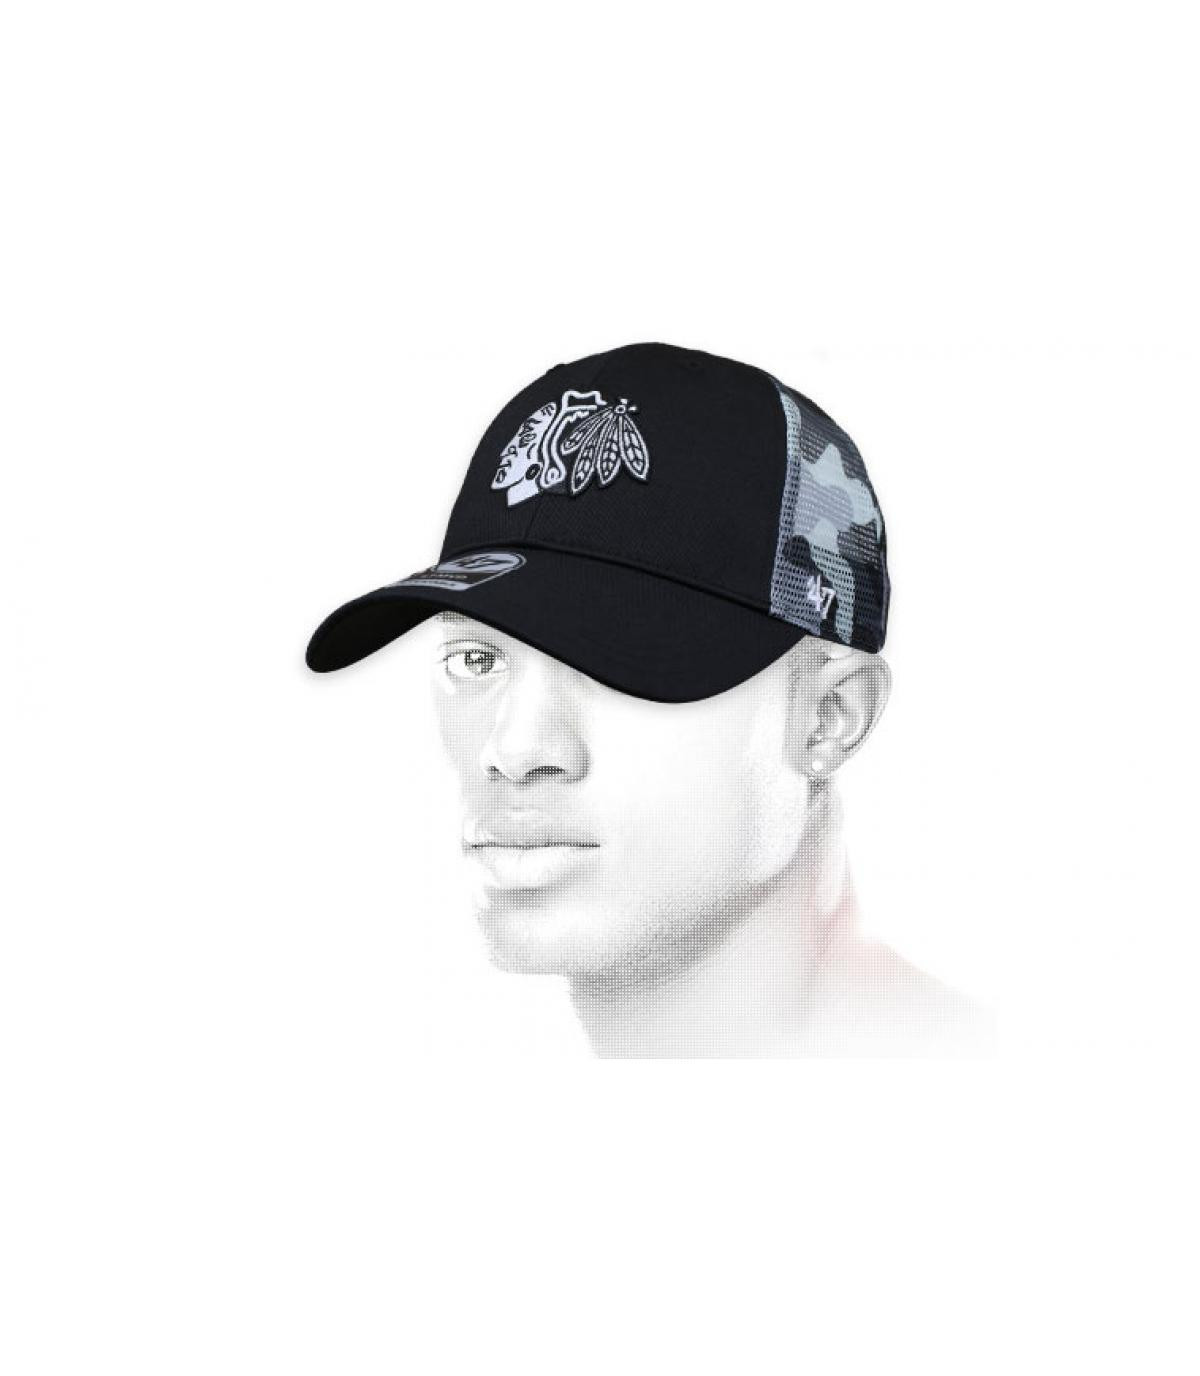 black camo Blackhawks cap